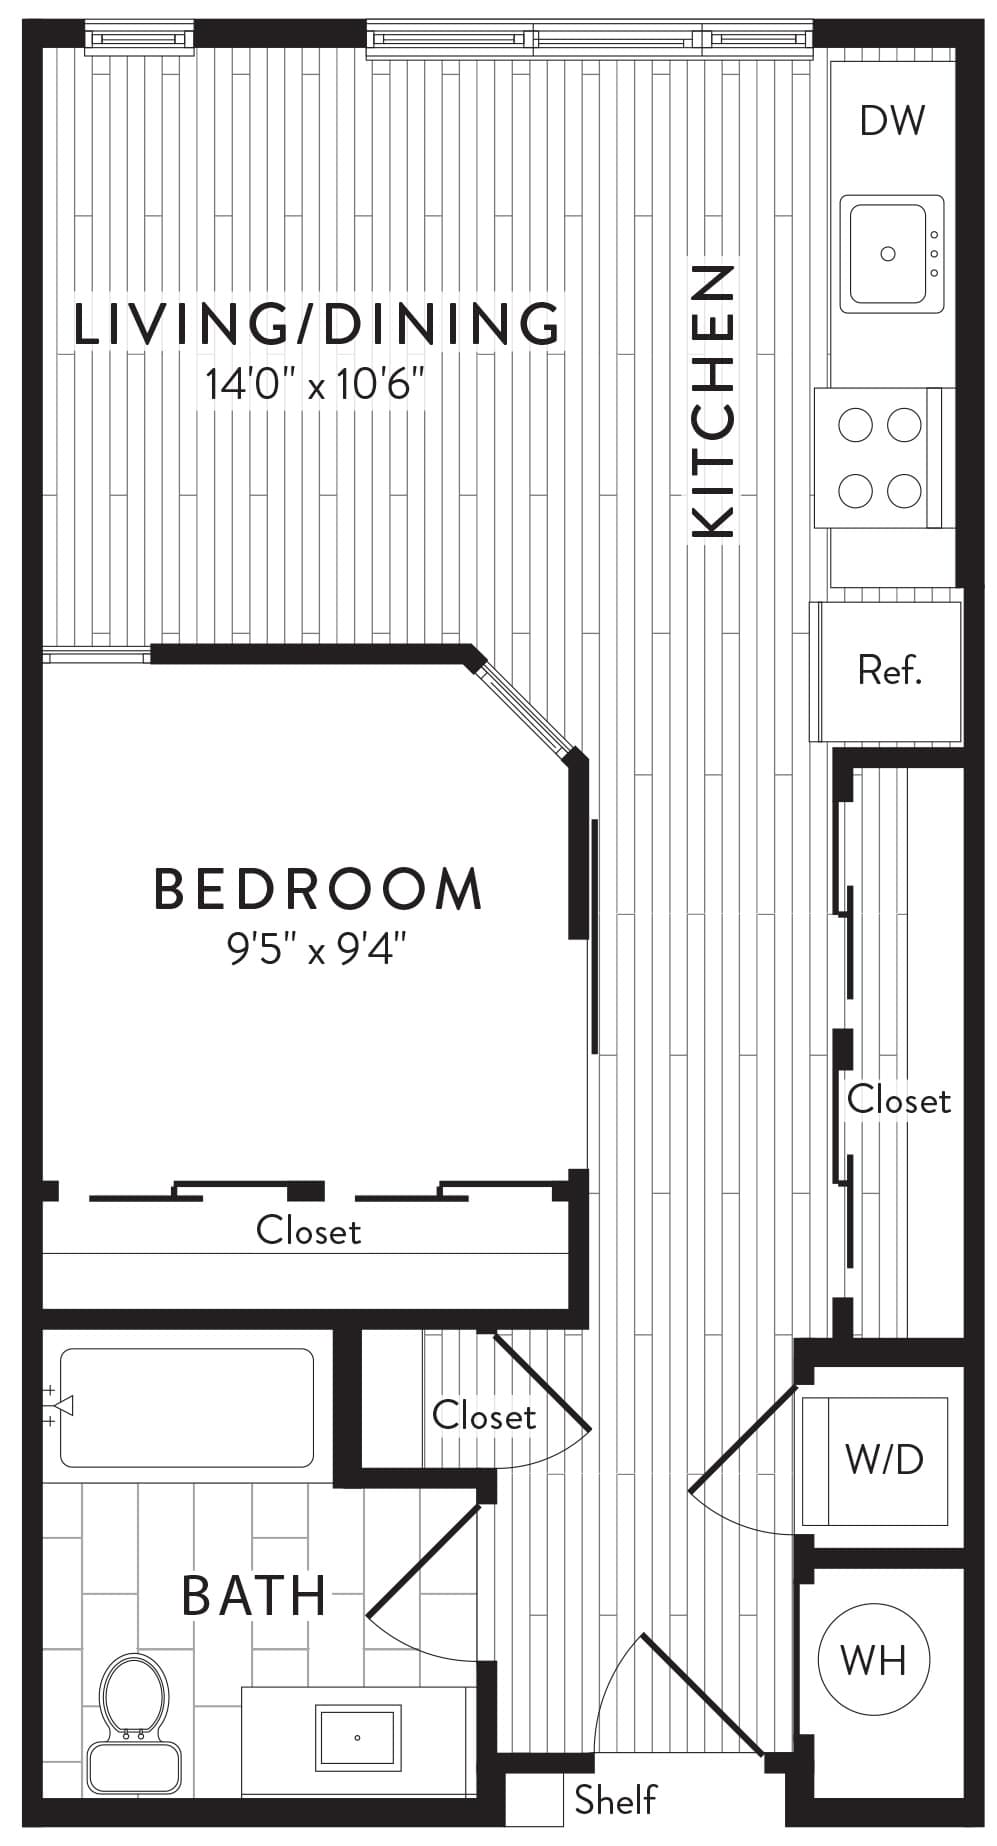 View Anthem House Apartment Floor Plans Studios 1 2 3 Bedrooms Bozzuto